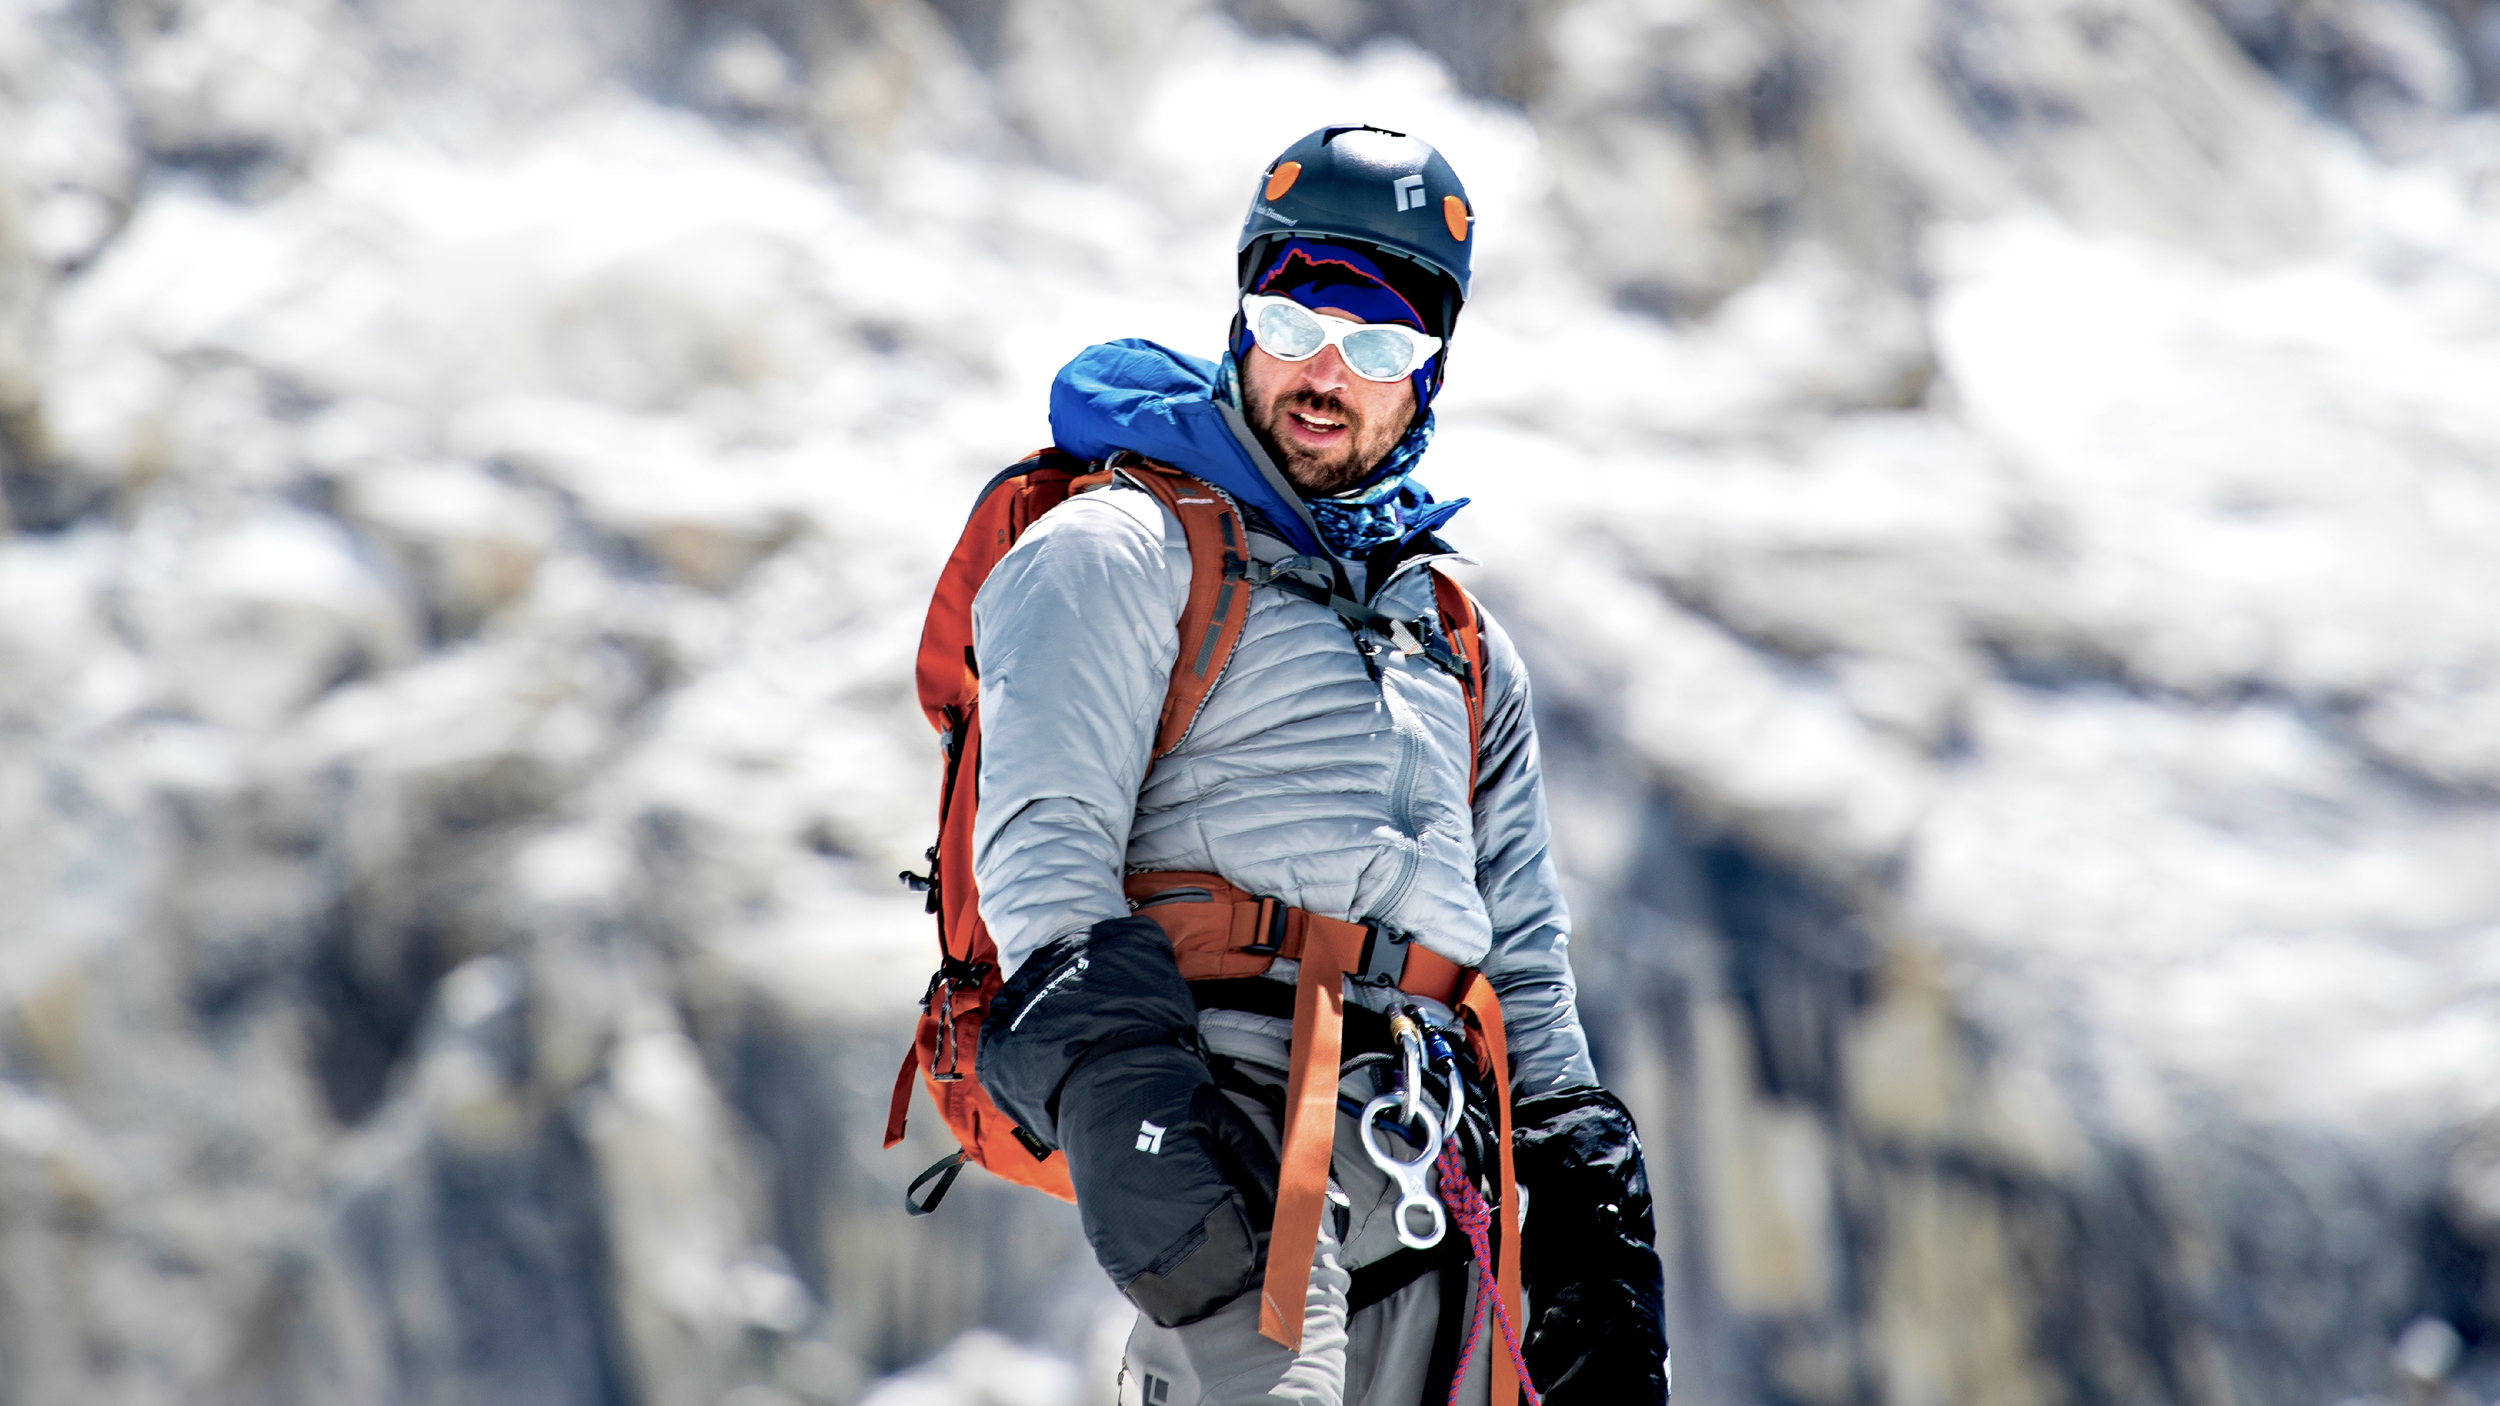 Chris Climbing in the Khumbu Icefall.png